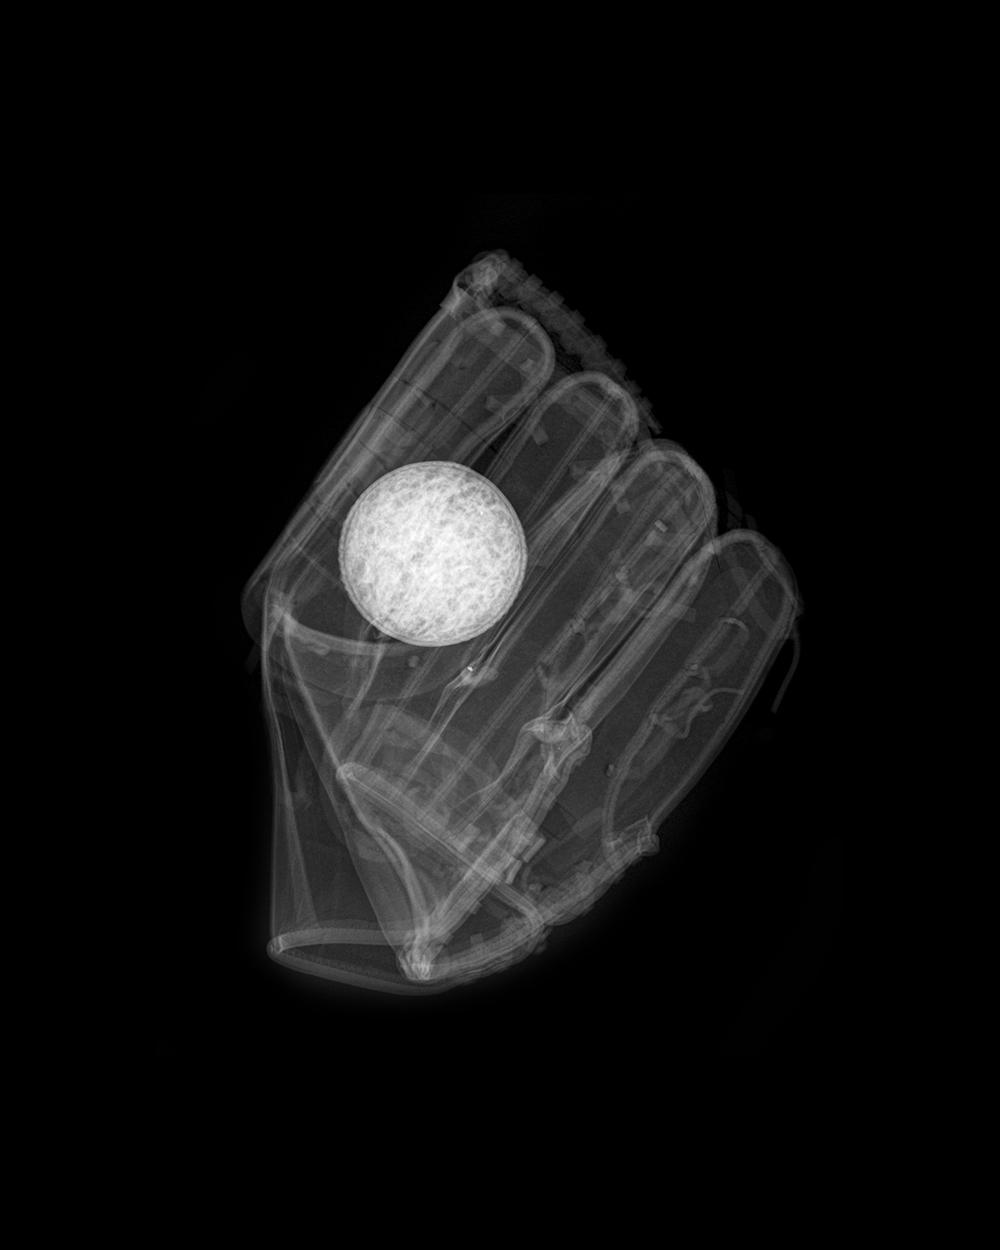 baseball_glove_final.jpg